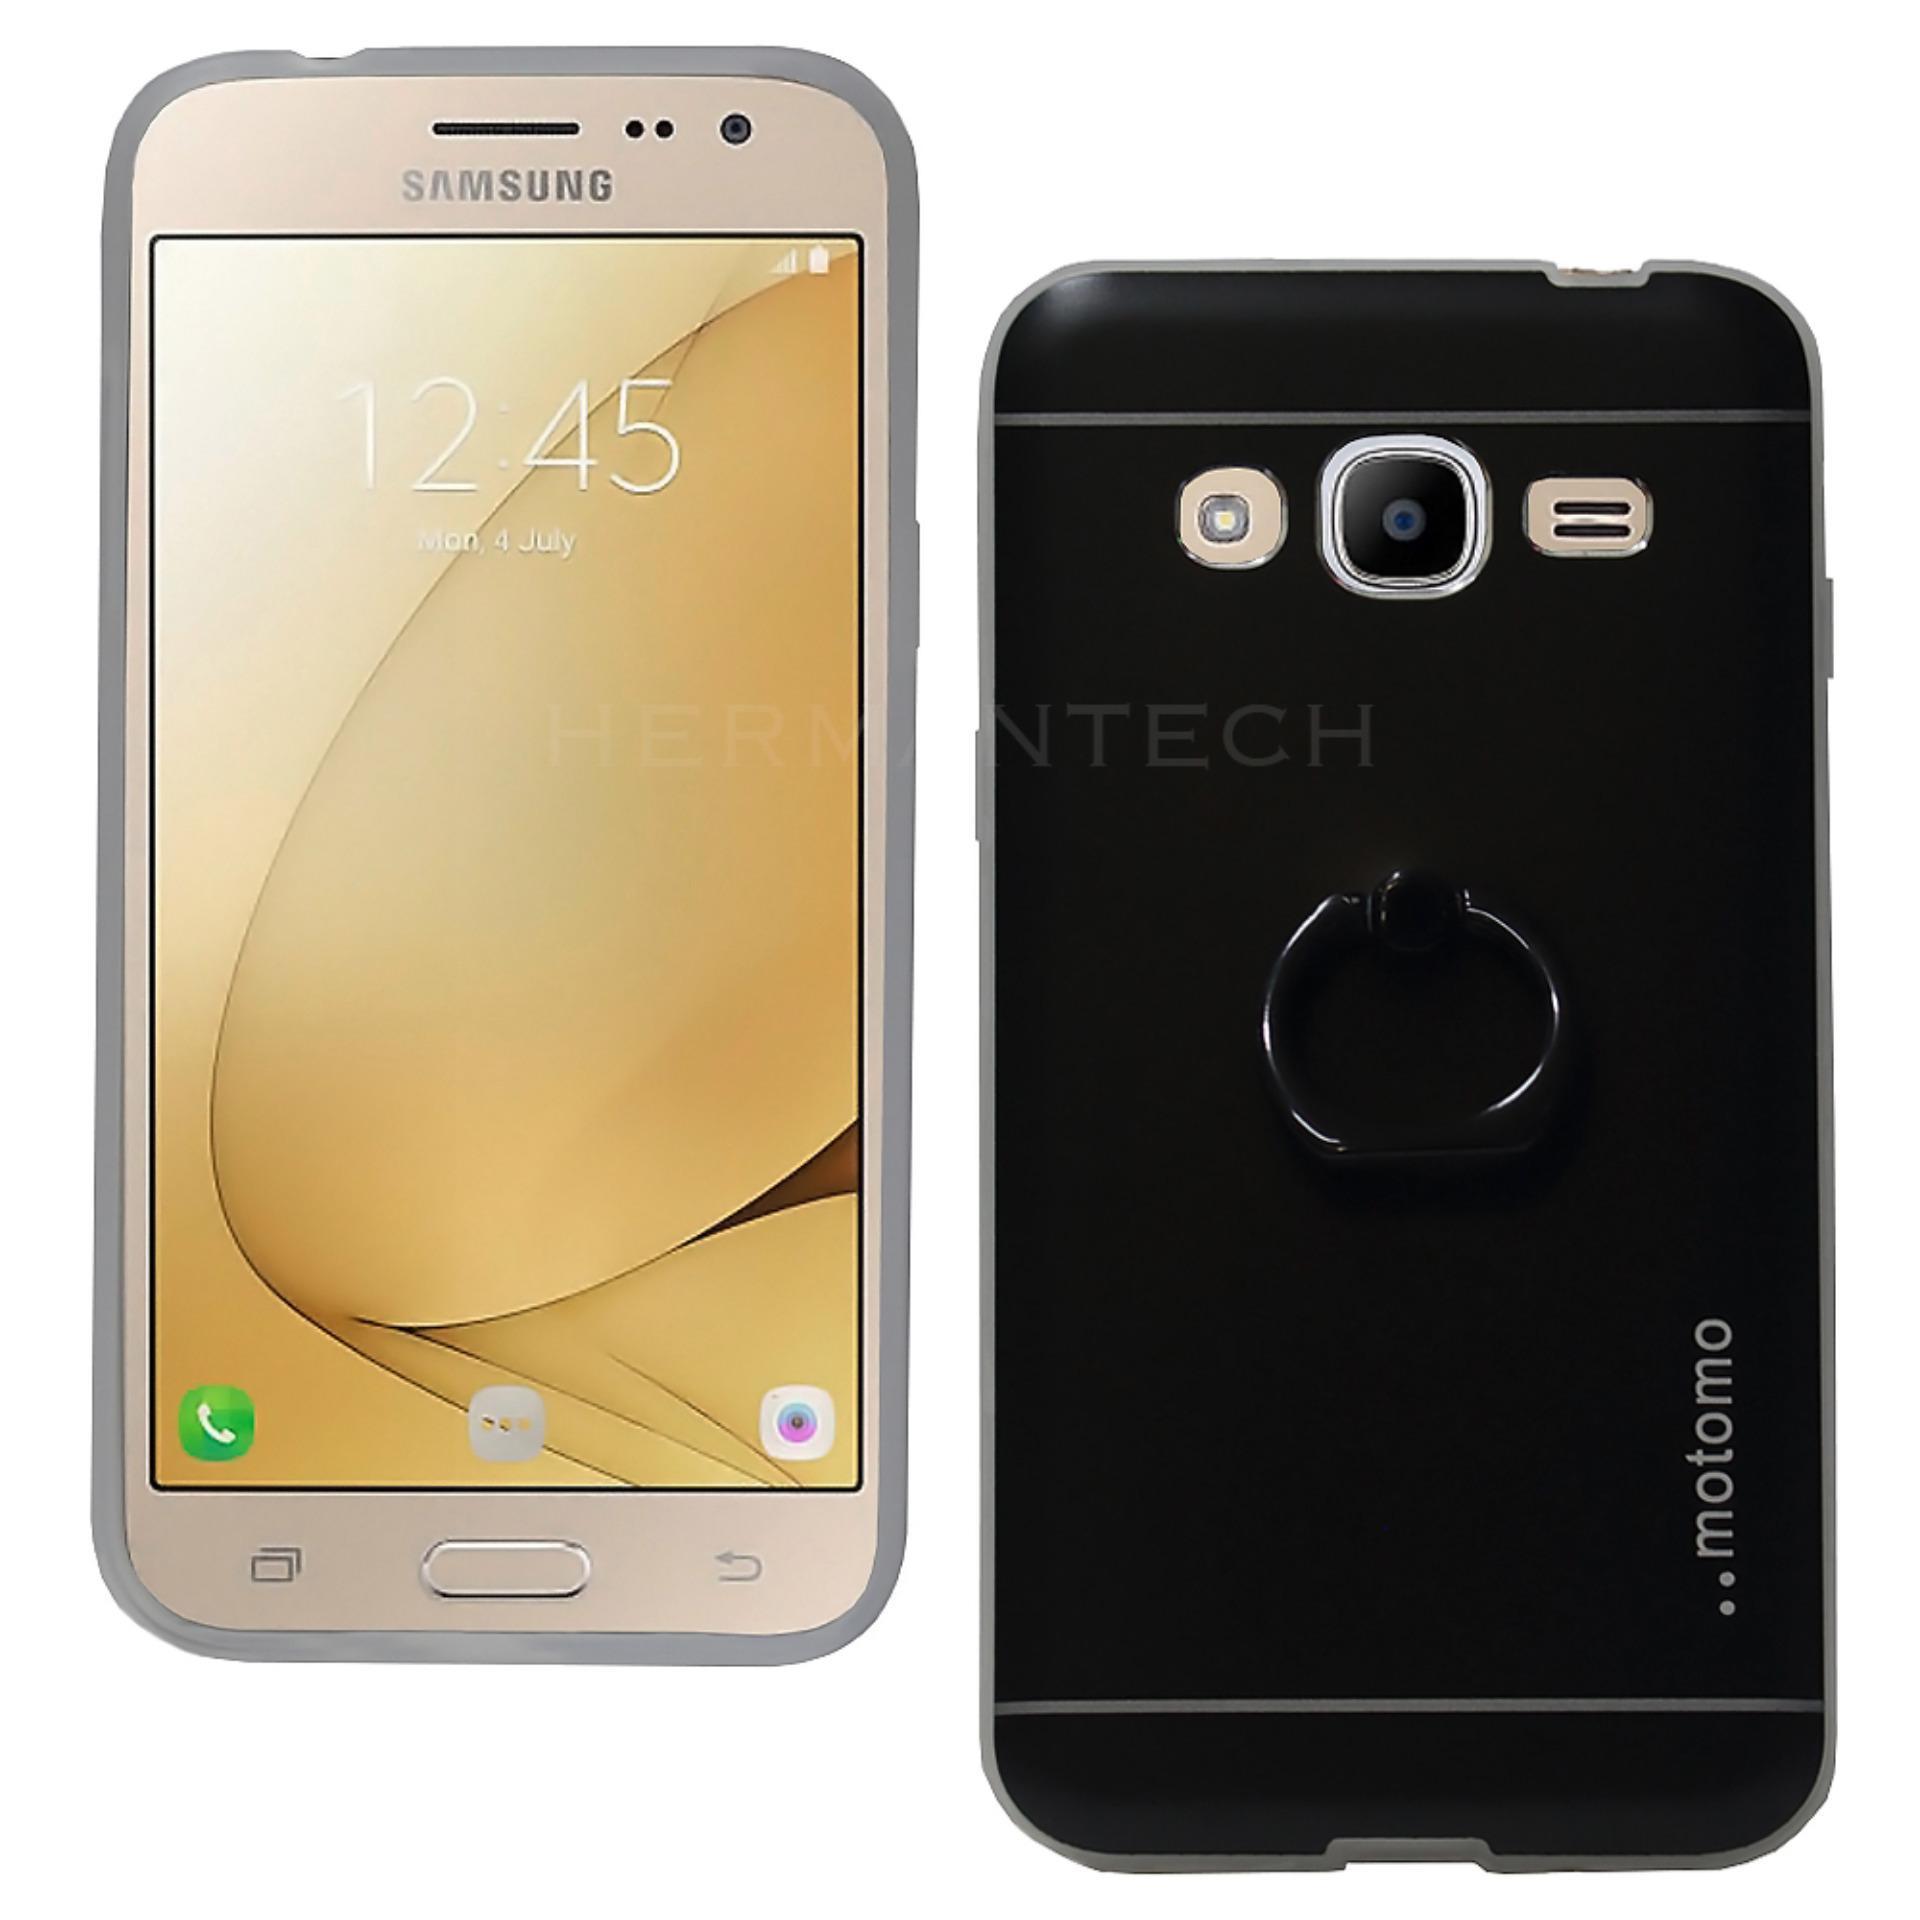 Kehebatan Lcd Samsung Galaxy J2 Pro J210 Full Touchscreen Dan Harga Ace 3 S7270 Putih Motomo Iring Metal Case For 2016 Hitam